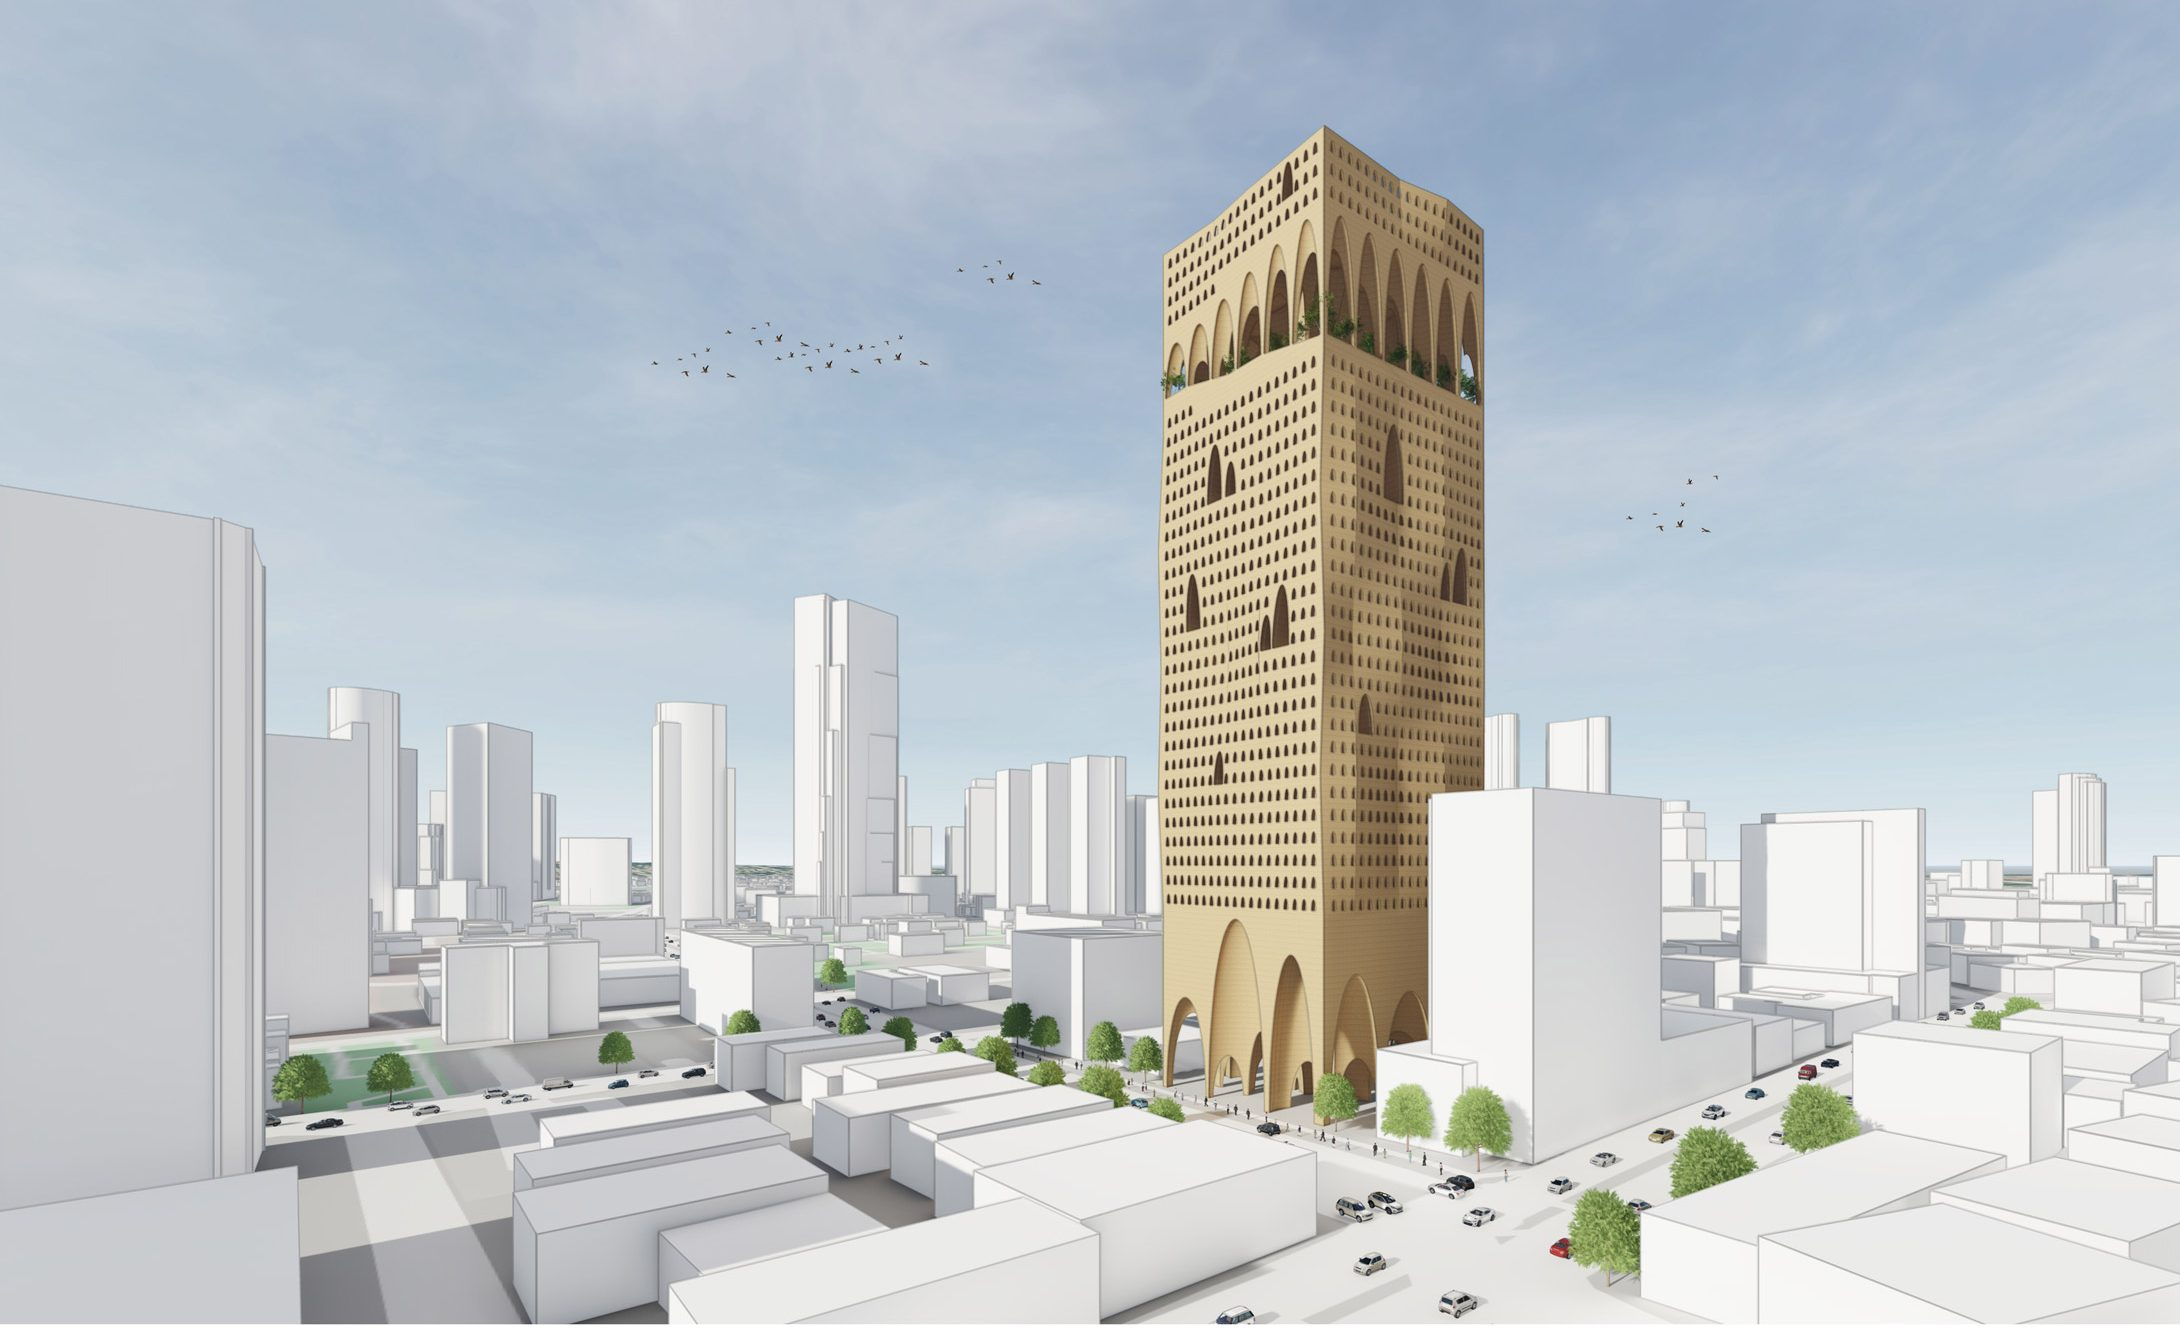 A visualisation of a golden skyscraper